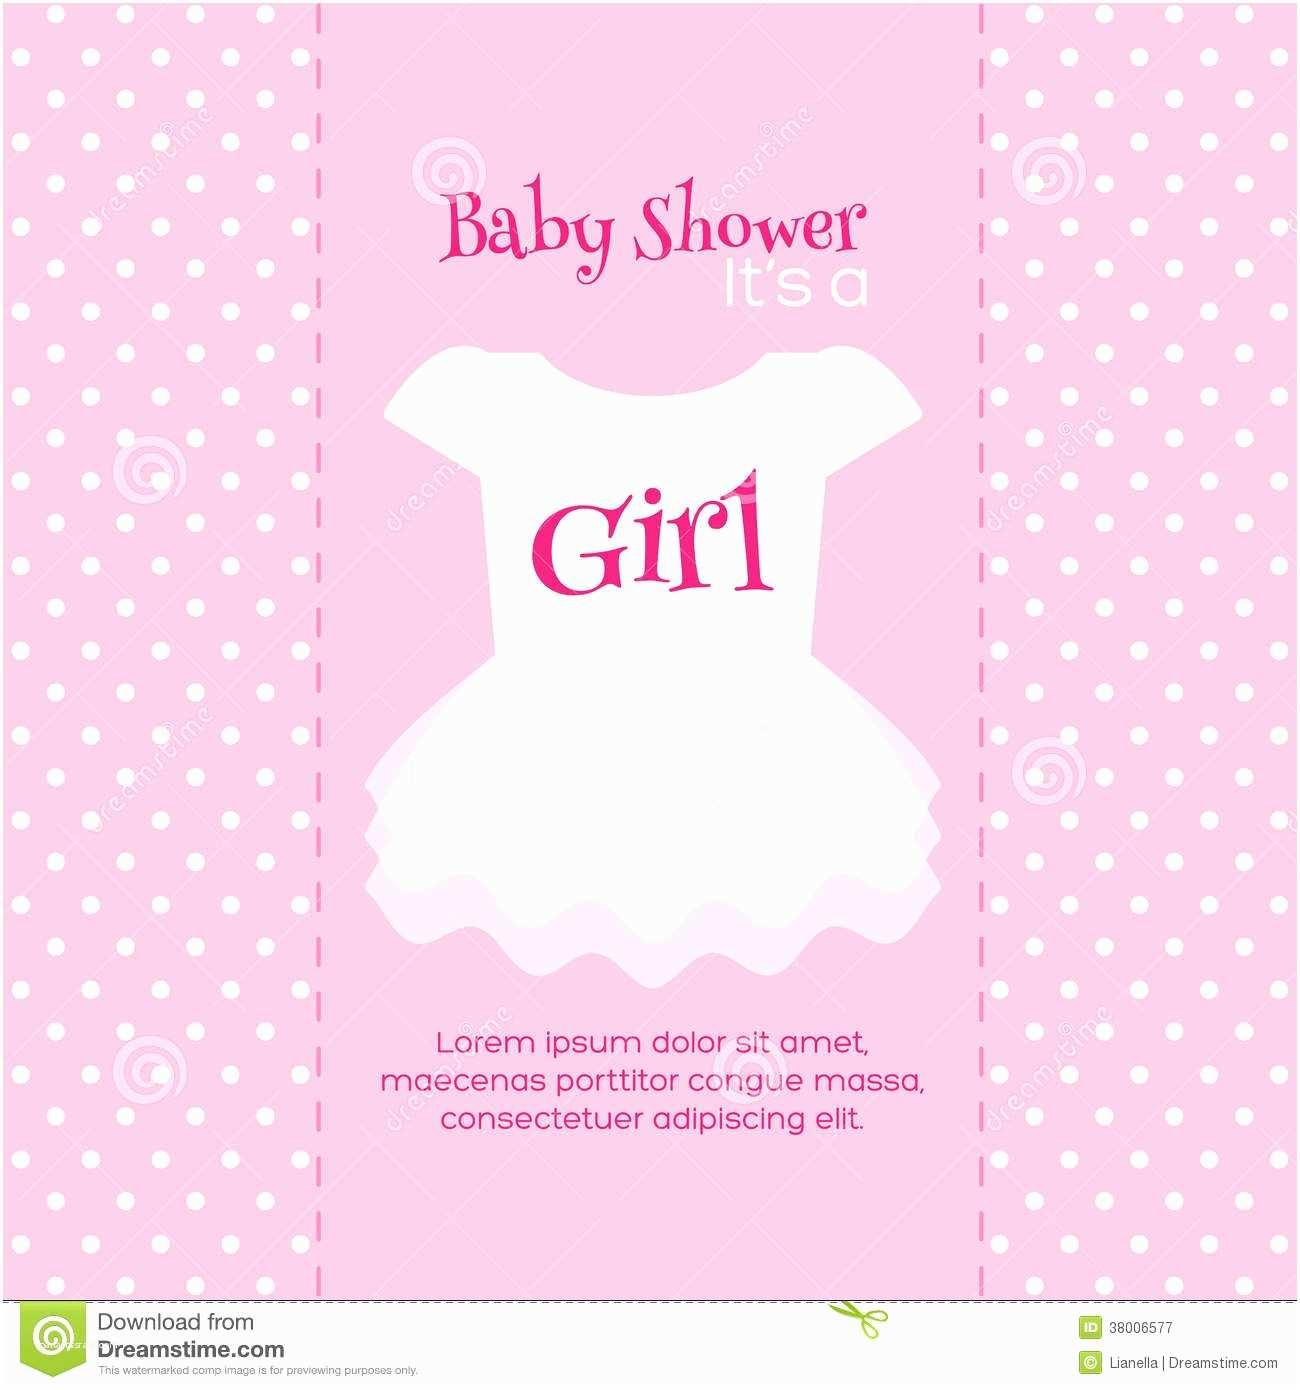 Baby Shower Invitation Templates Girl Baby Shower Invitations Templates